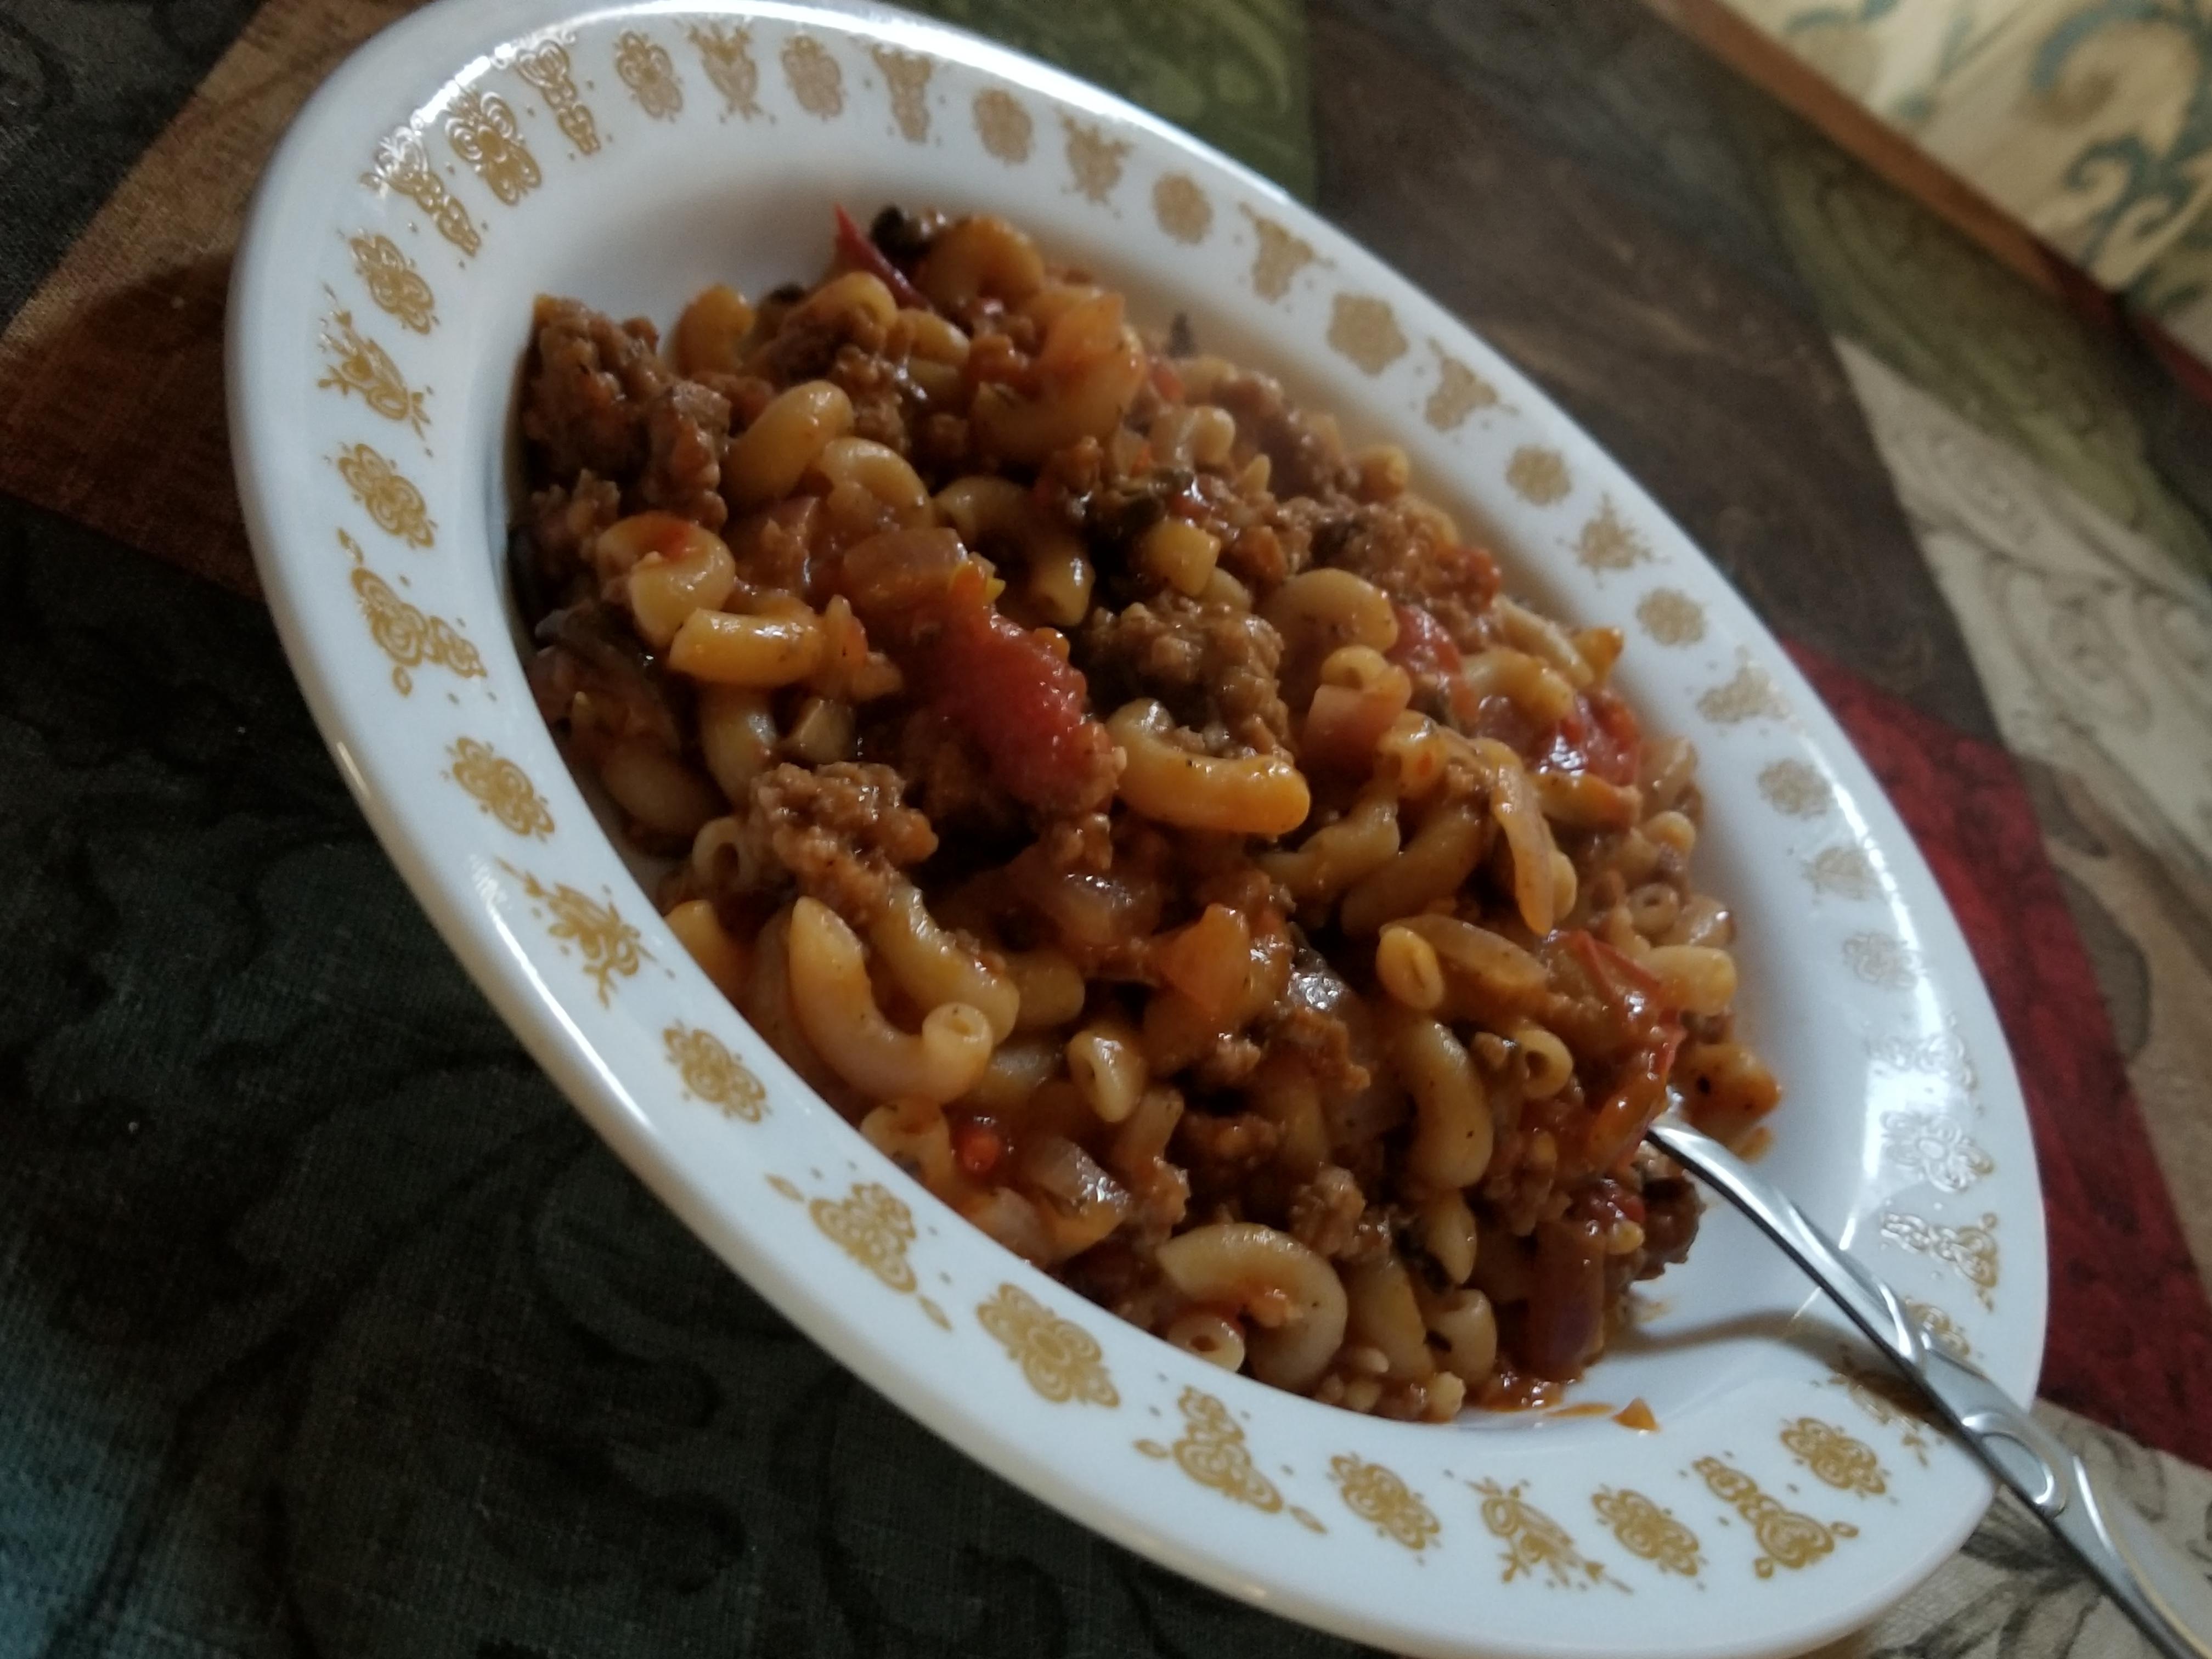 A Minnesotan's Beef and Macaroni Hotdish Mee Maw